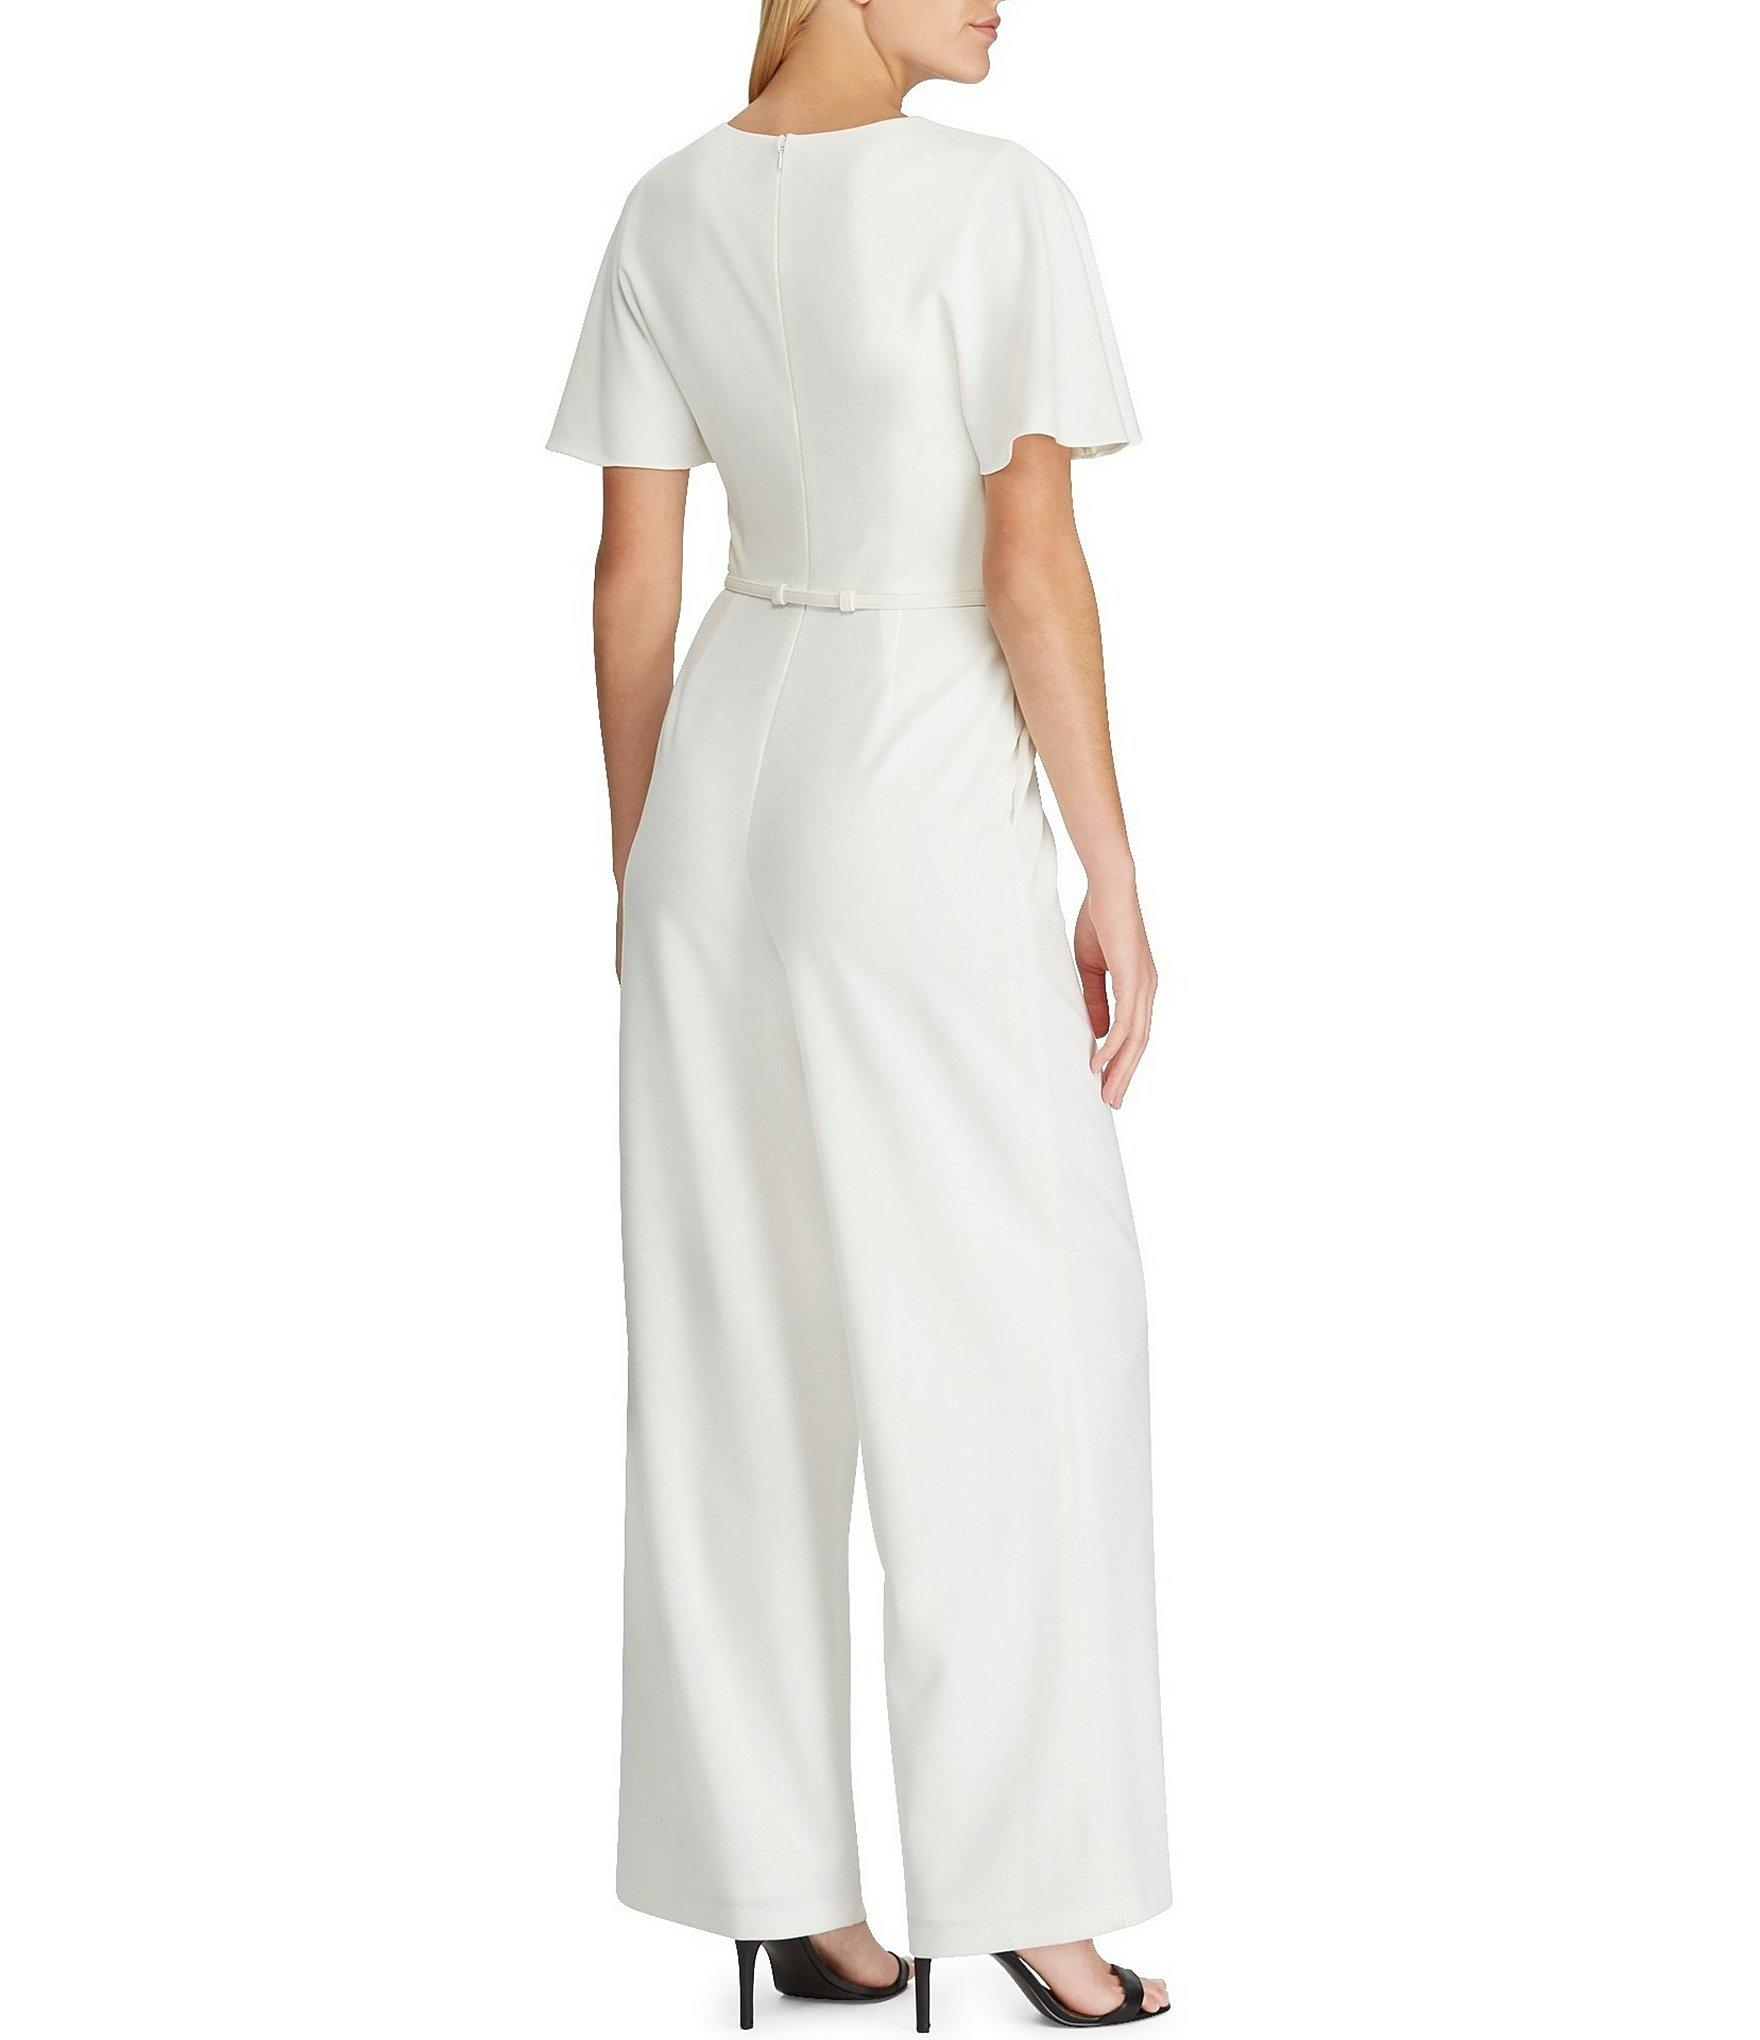 943c699217a Lauren by Ralph Lauren - White Crepe Wide Leg Belted Jumpsuit - Lyst. View  fullscreen